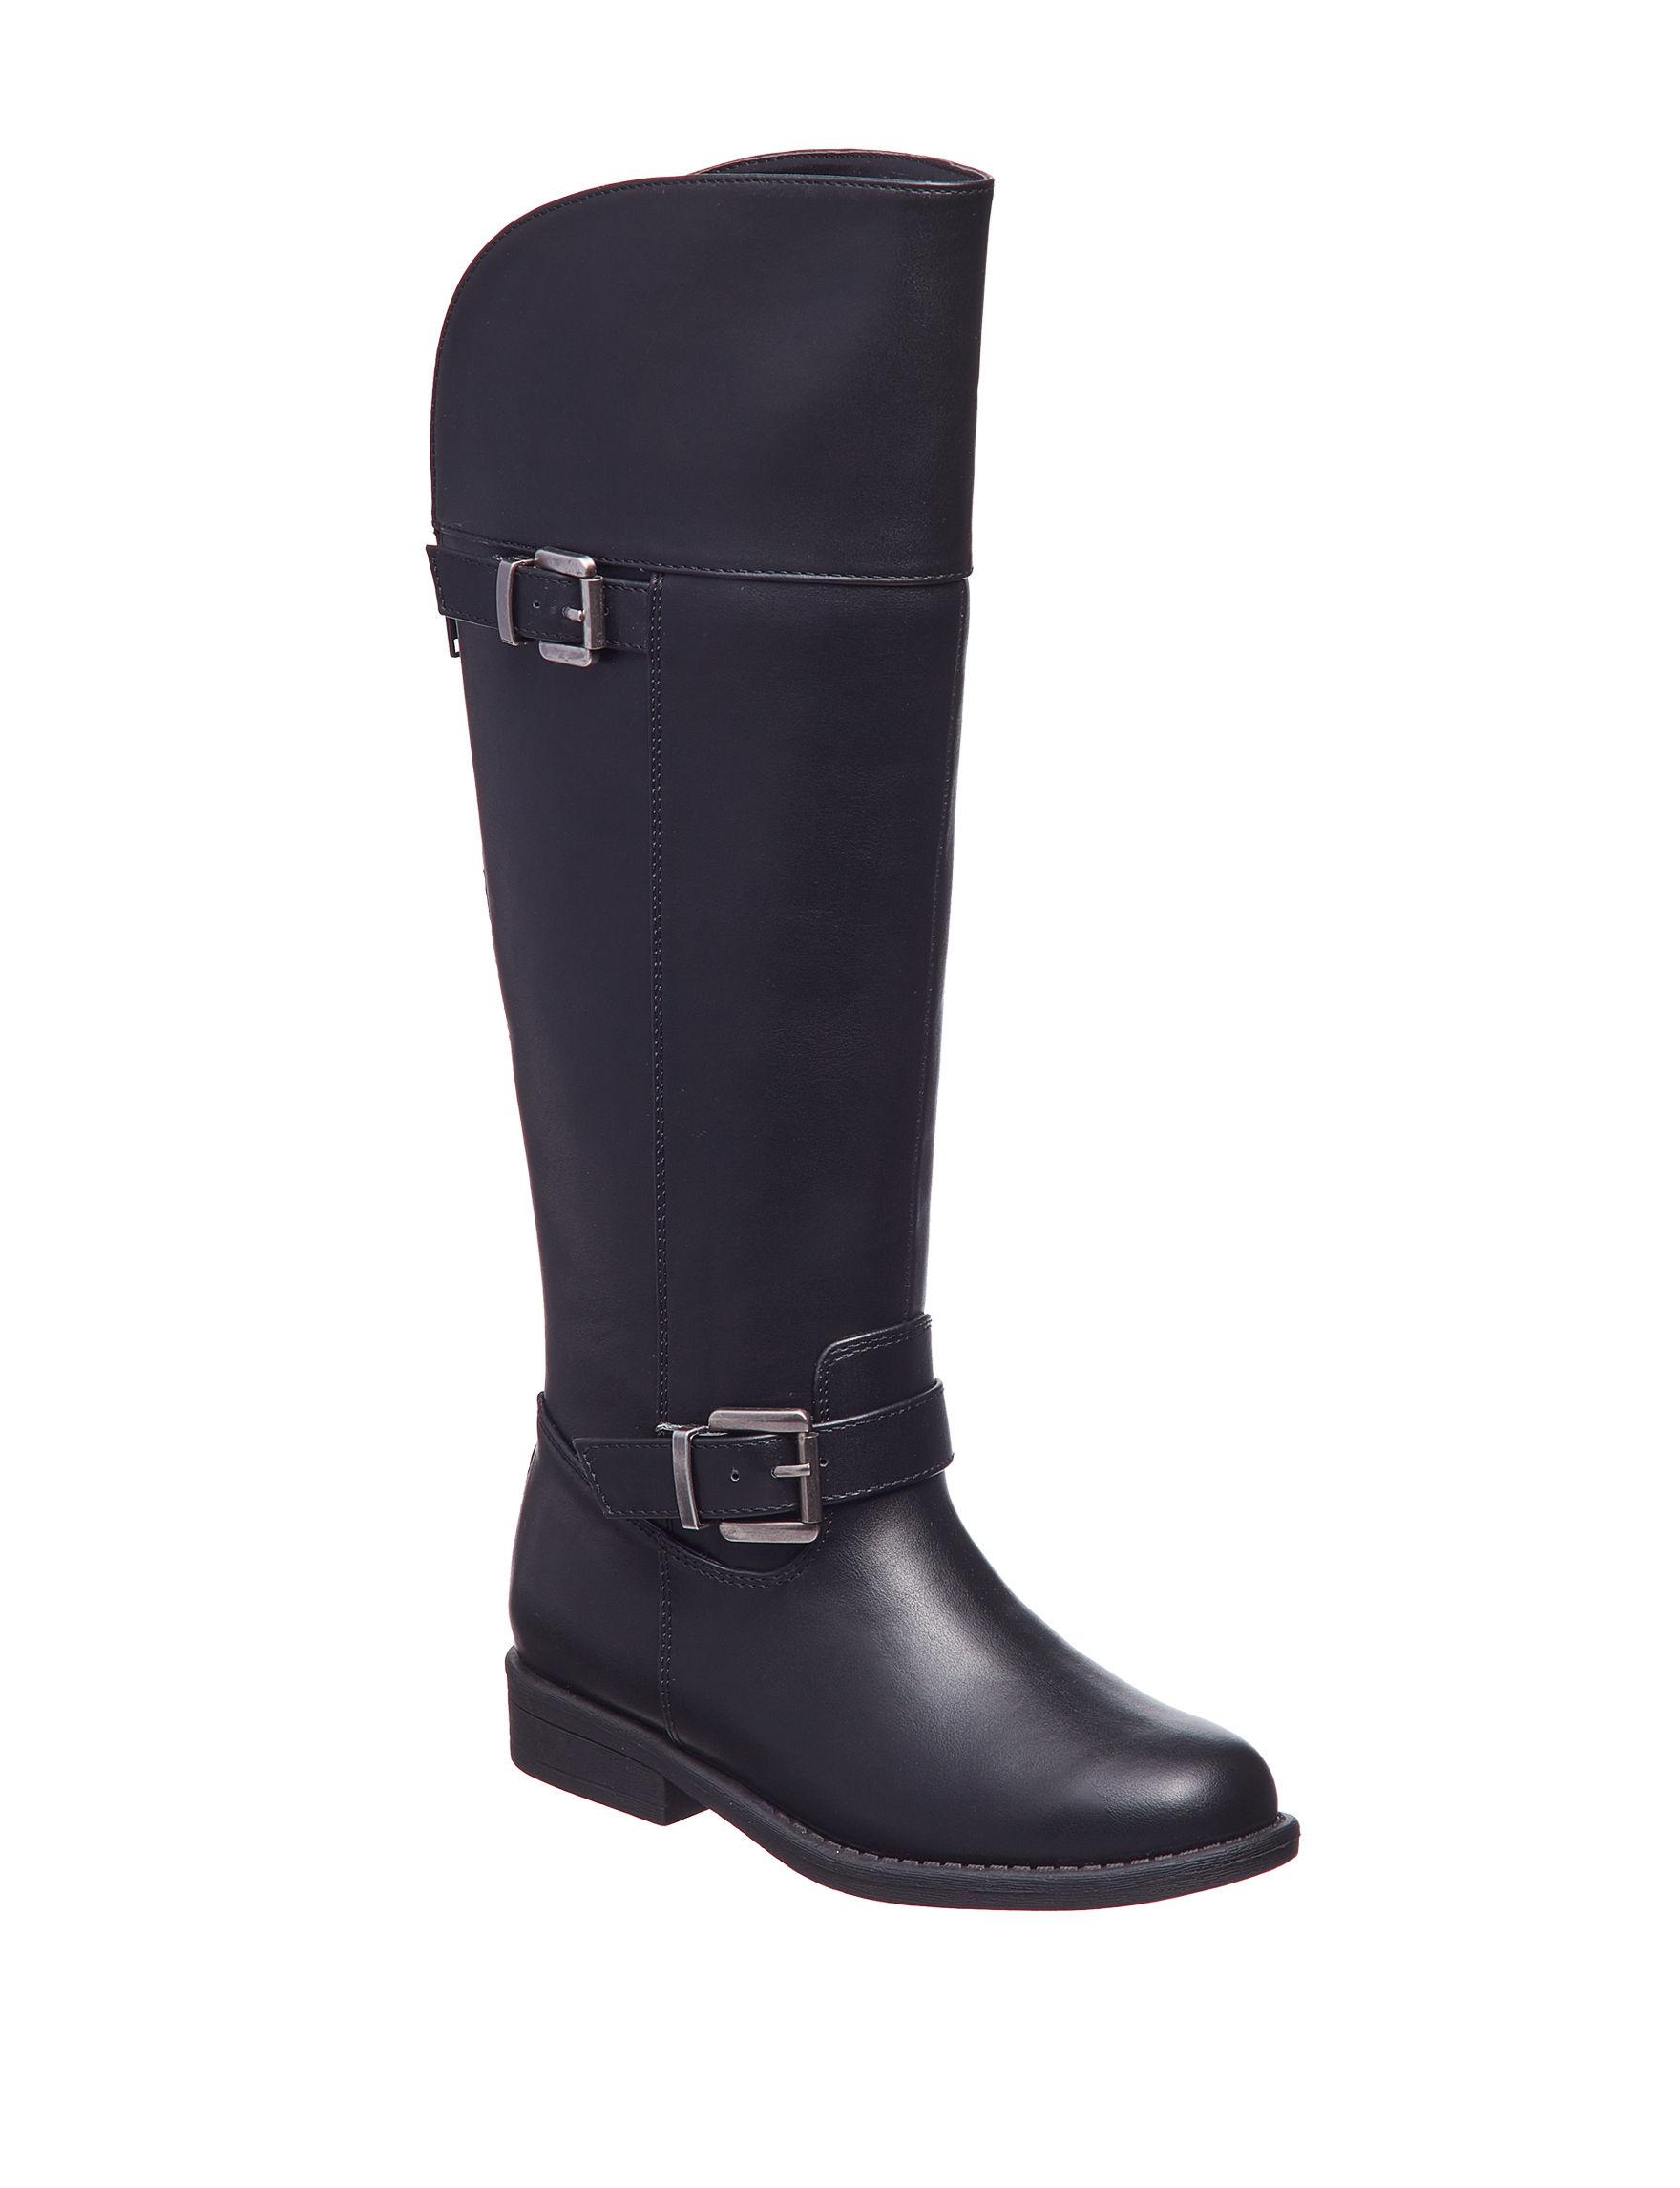 143 Girl Black Riding Boots